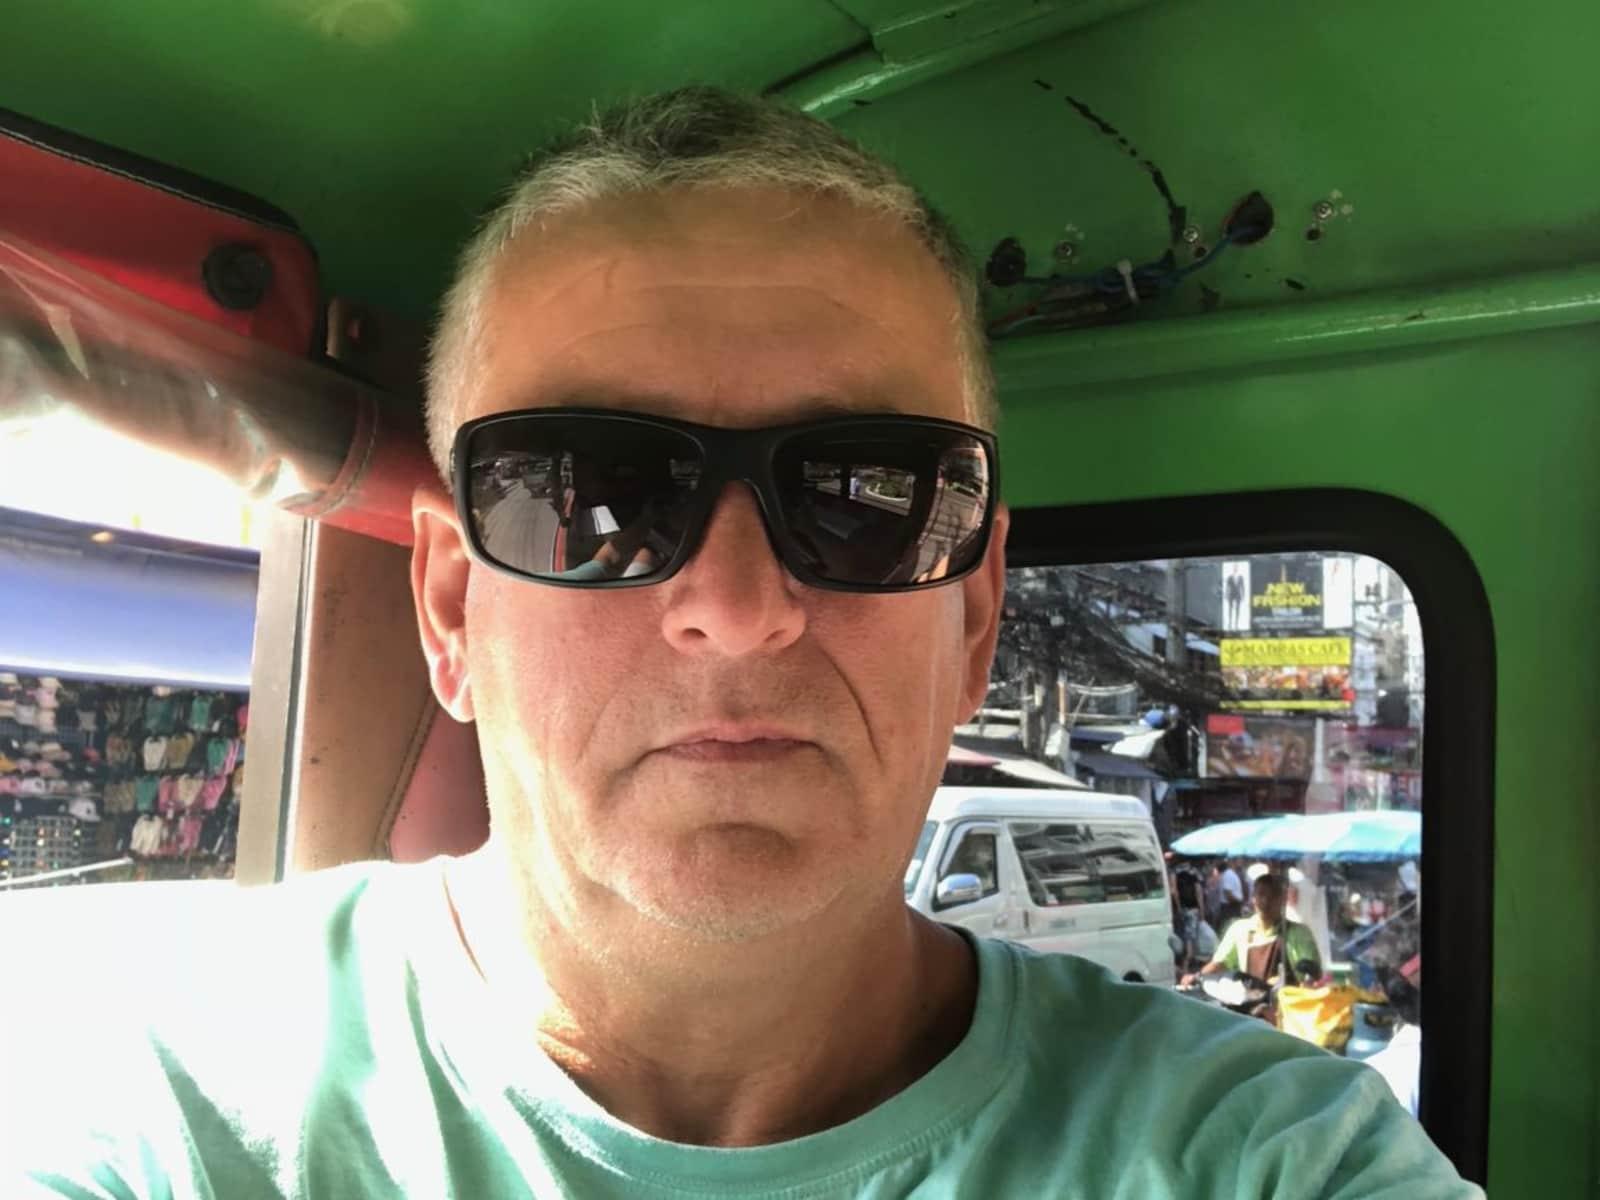 John from Mount Maunganui, New Zealand